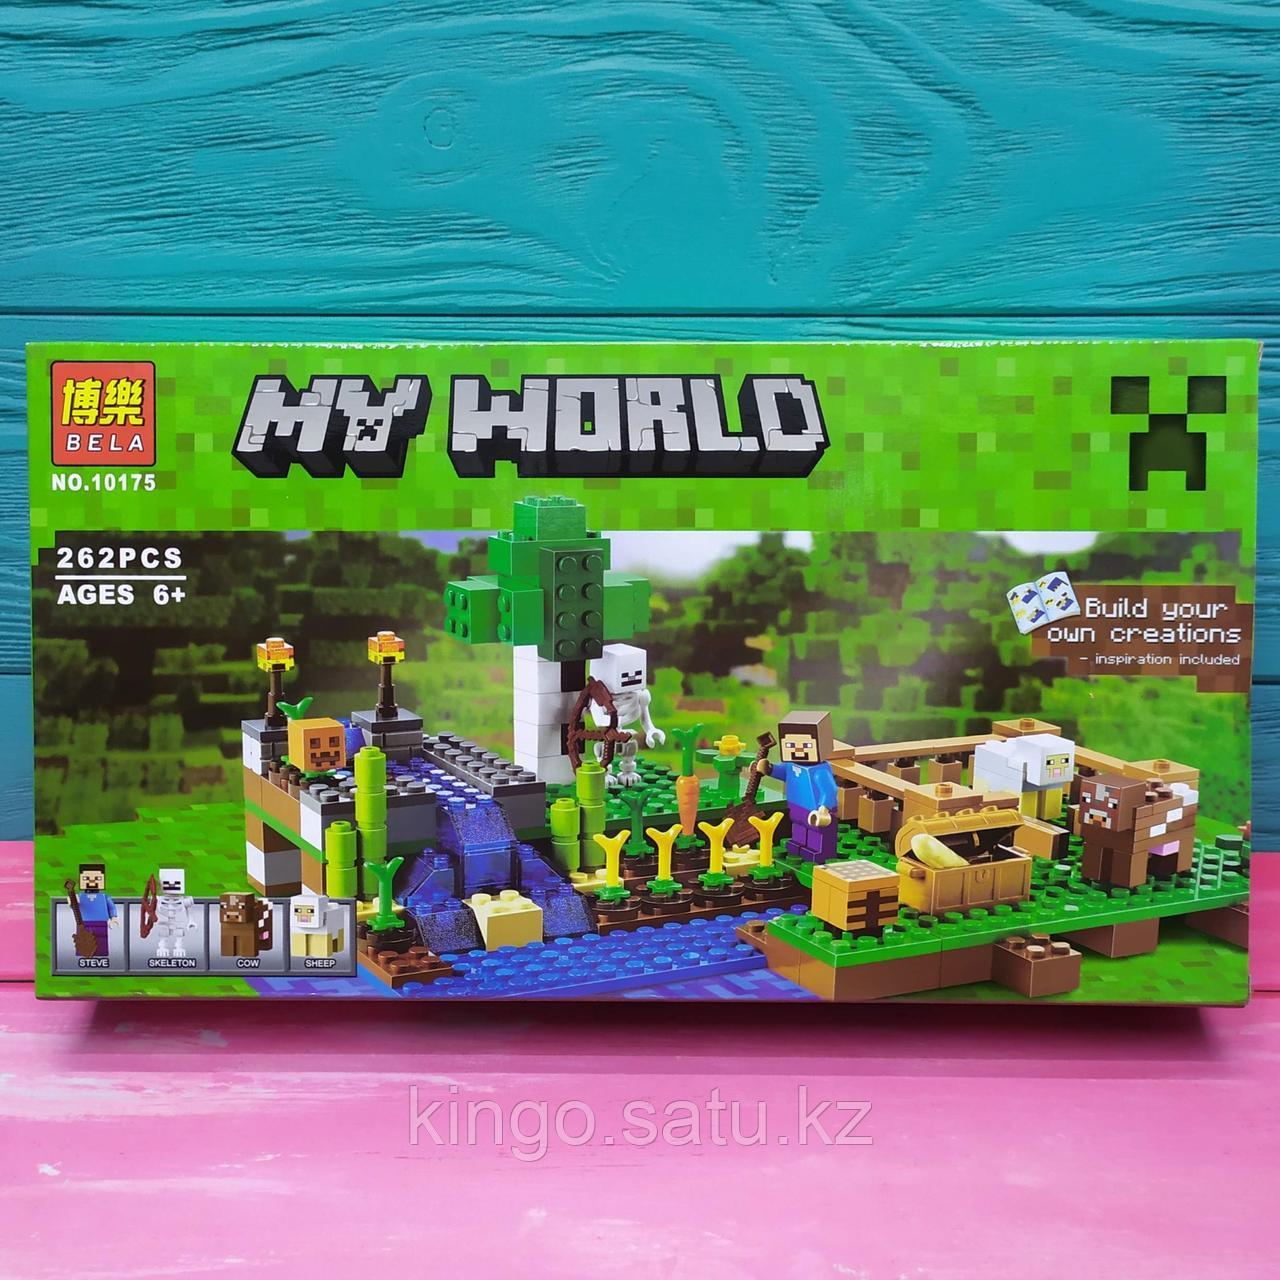 Конструктор Bela Minecraft Ферма 10175 (Аналог Lego Minecraft 21114) 262 детали